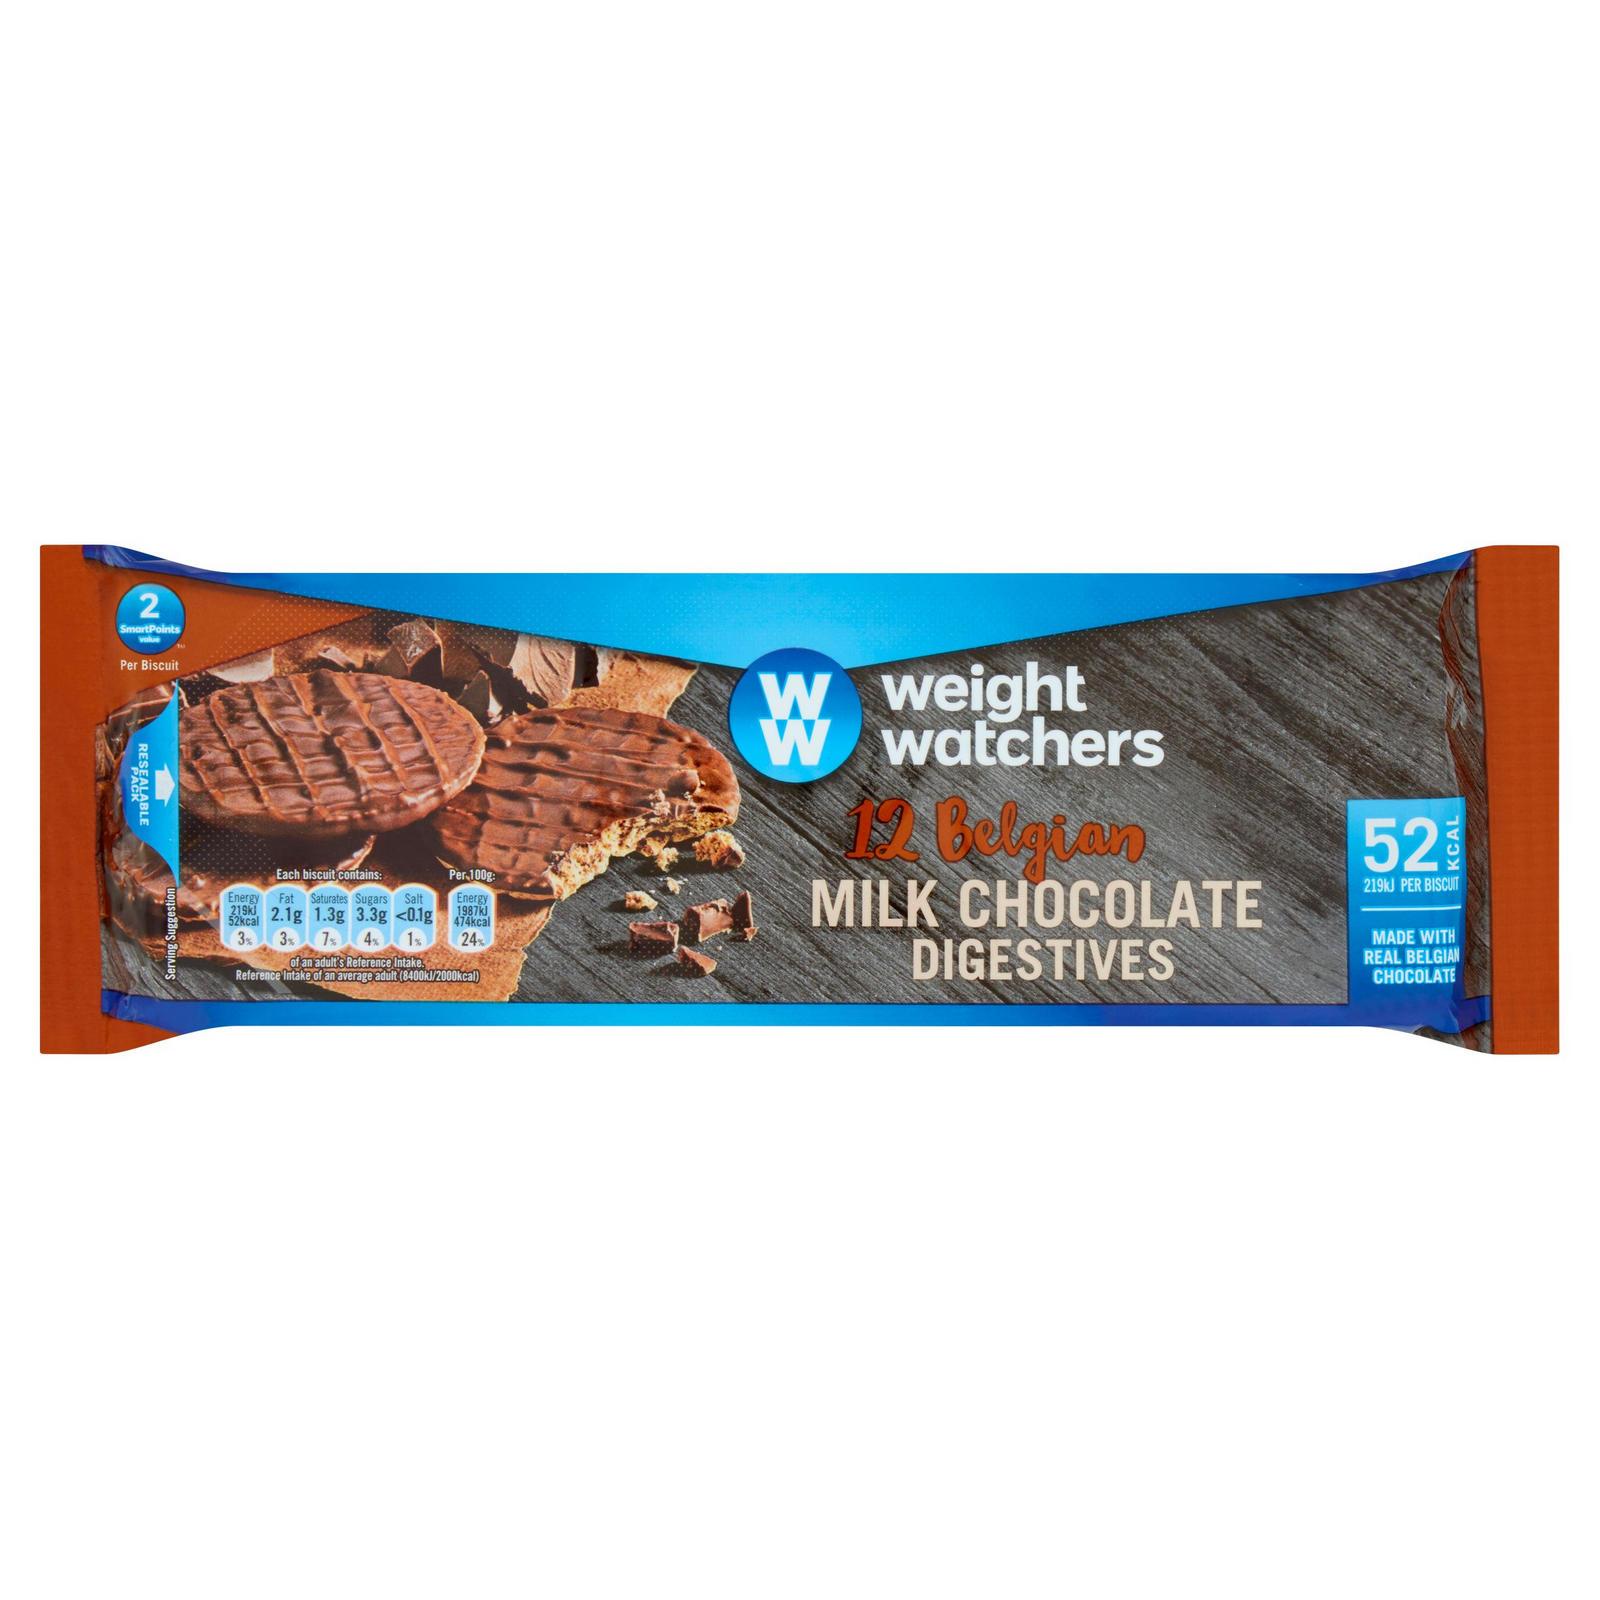 Weight Watchers 12 Belgian Milk Chocolate Digestives 132g